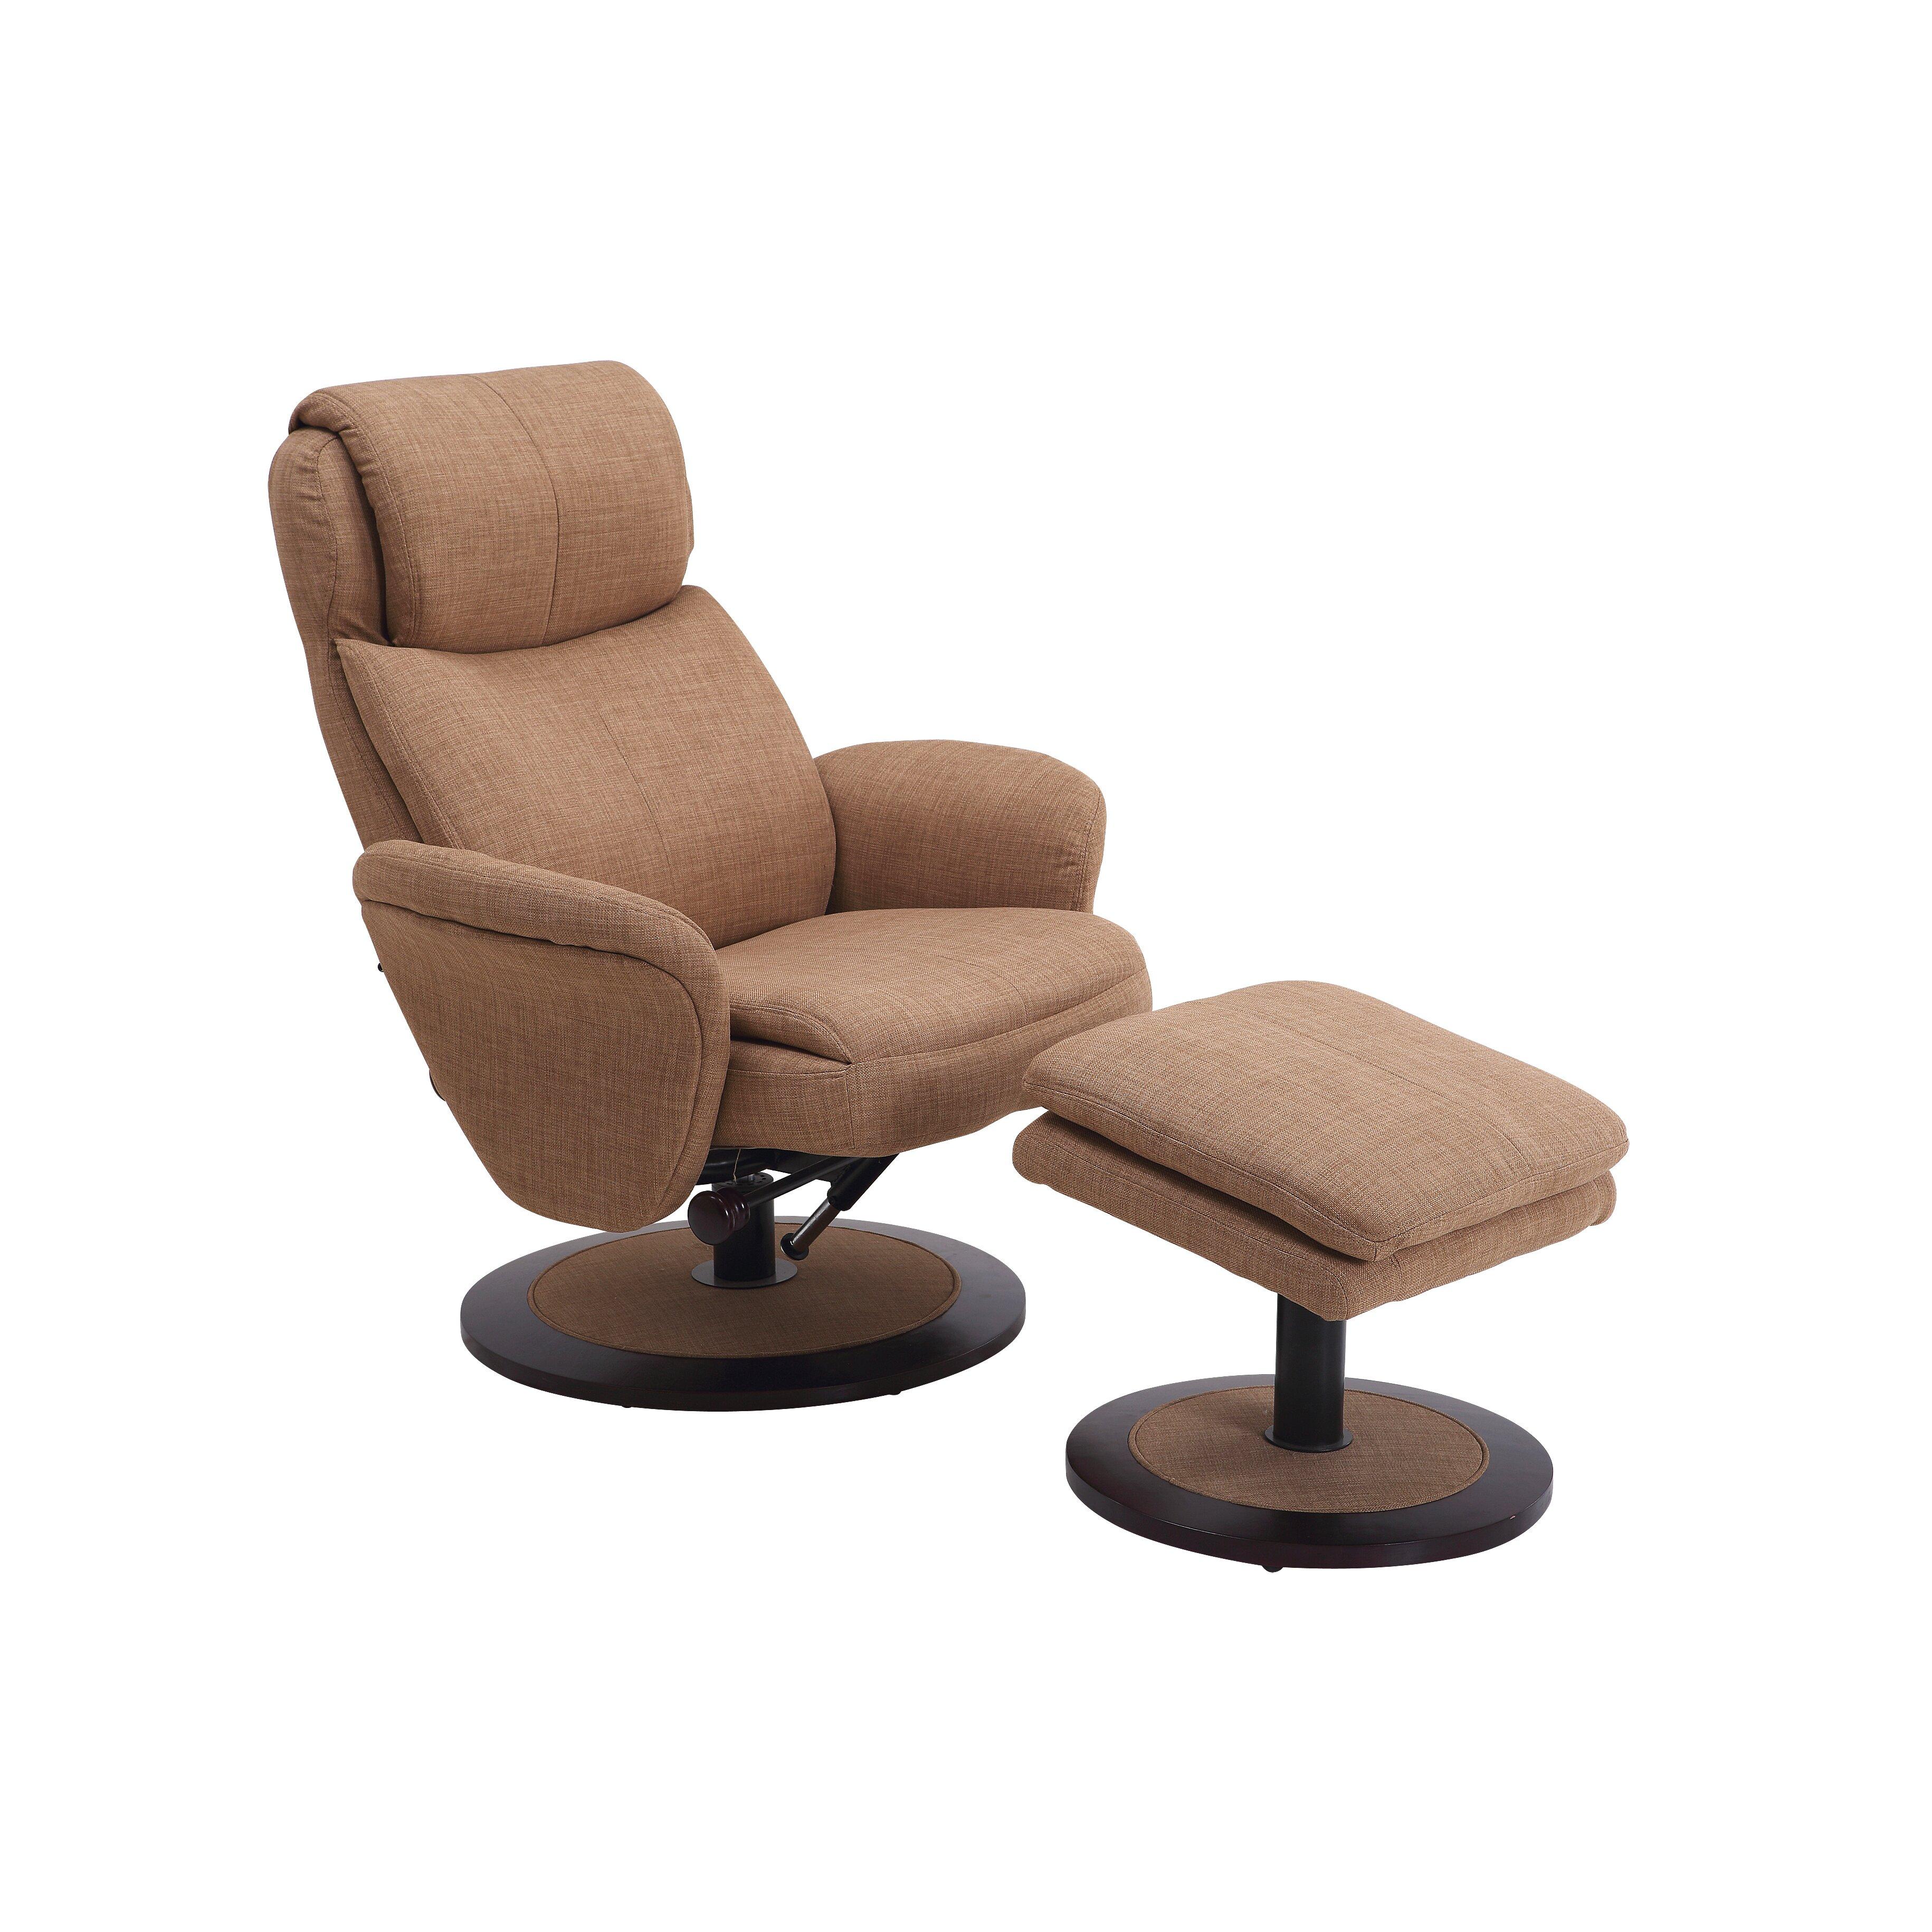 Furniture living room furniture brown recliners comfortchair sku